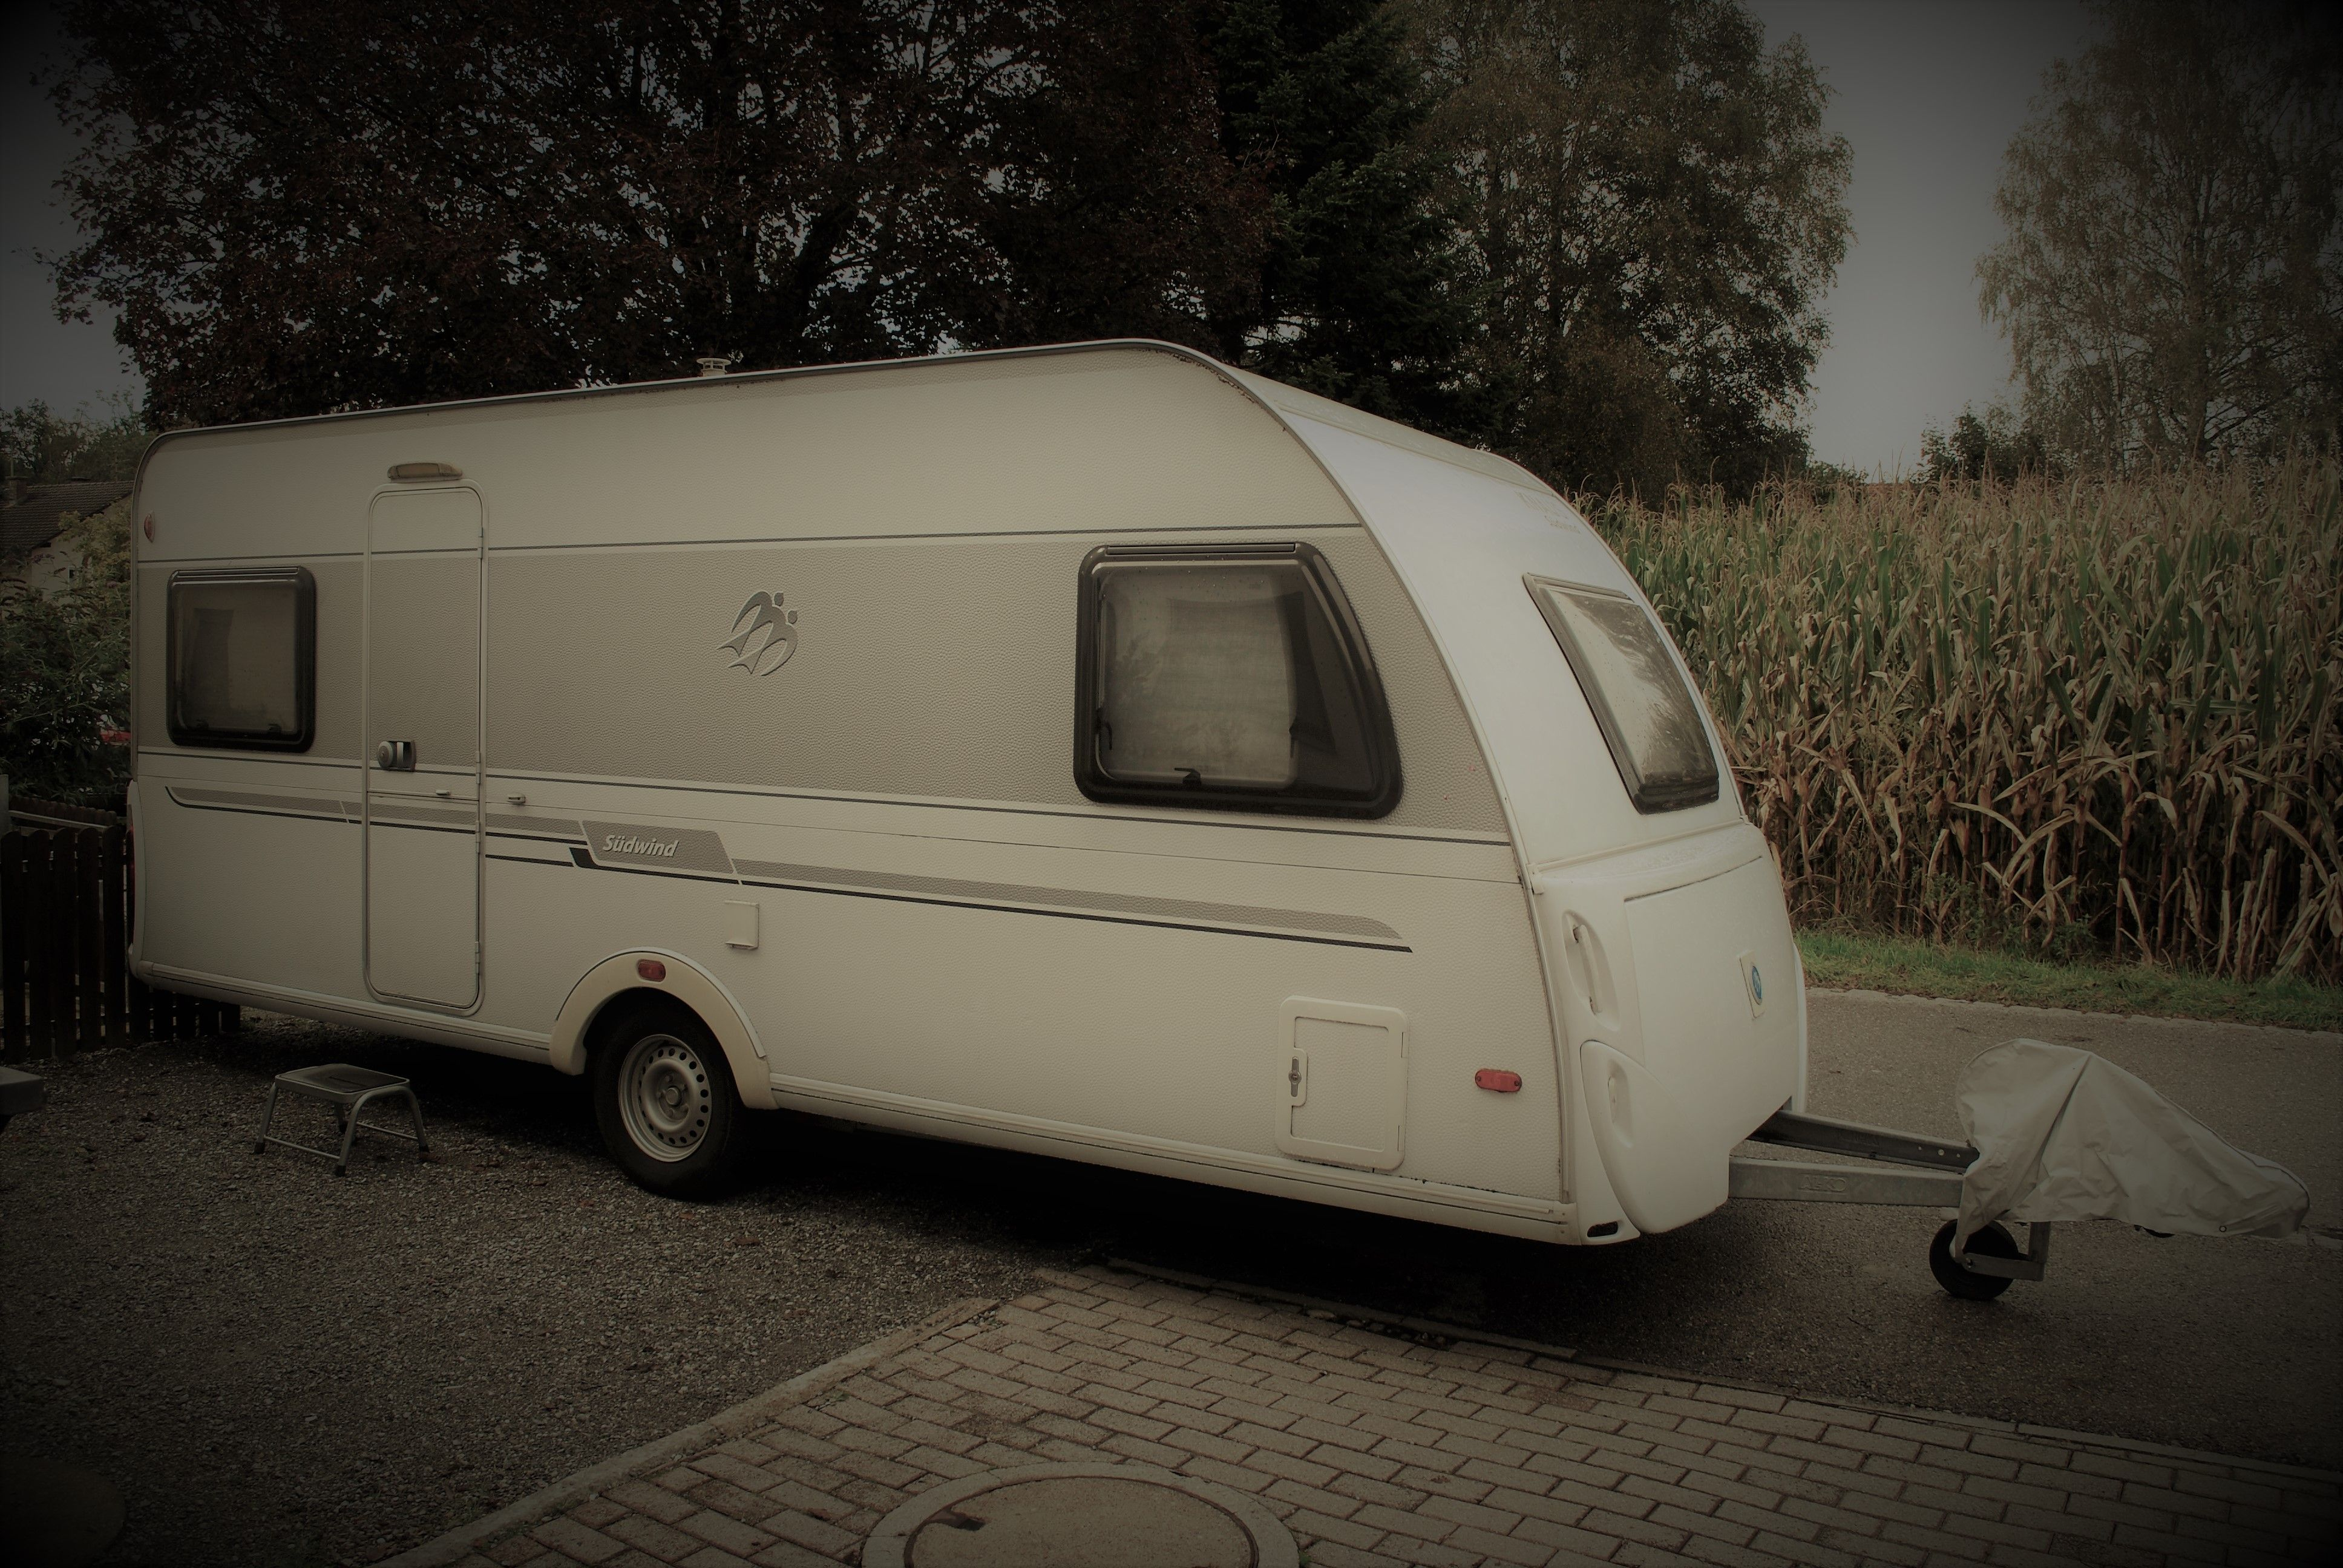 Empfohlen von: www.caravan-rosenheim.de  Wohnwagen mieten